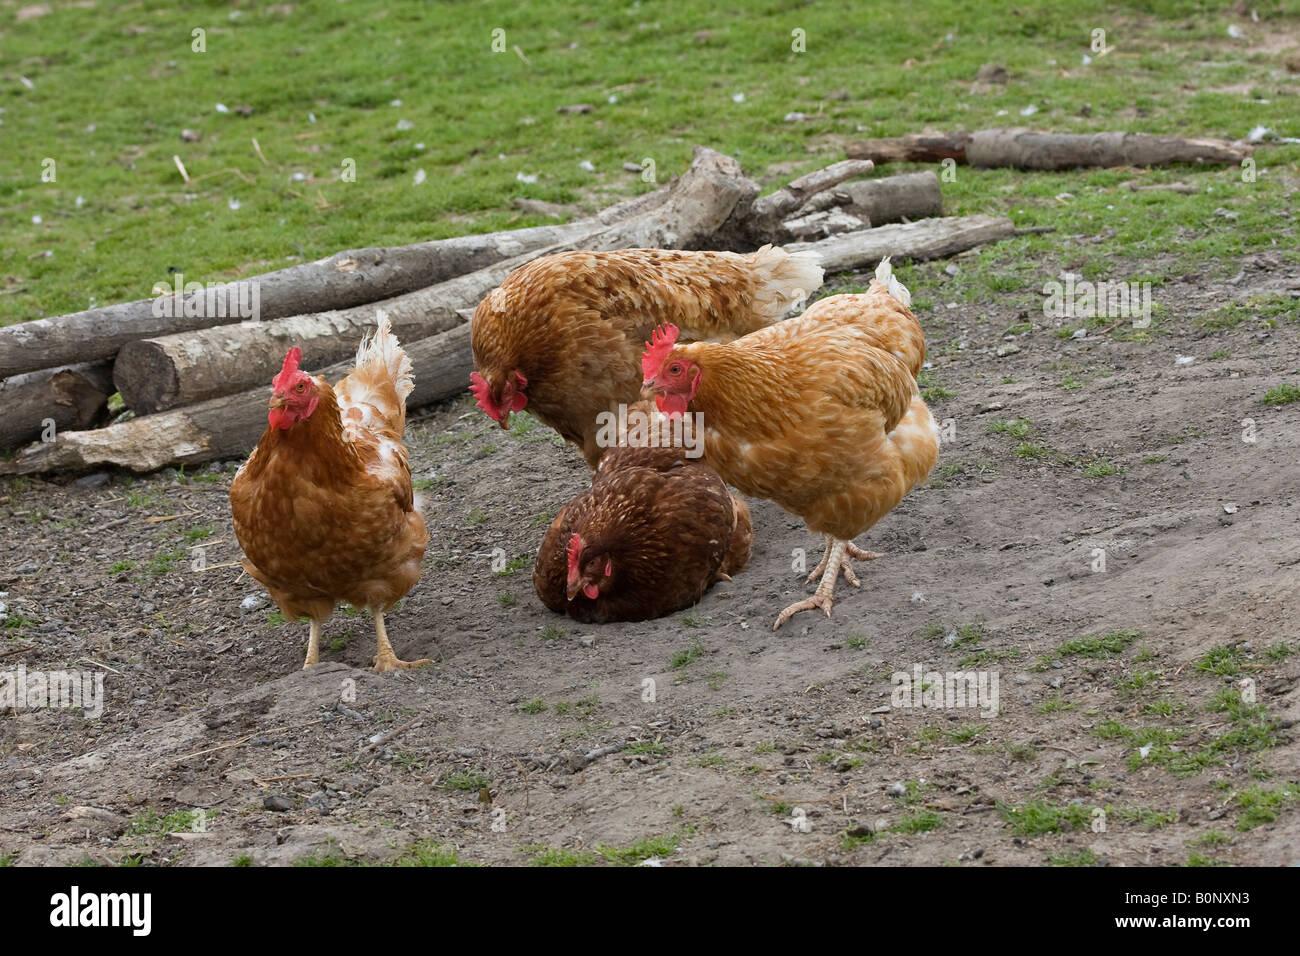 Free range chickens on farm - Stock Image